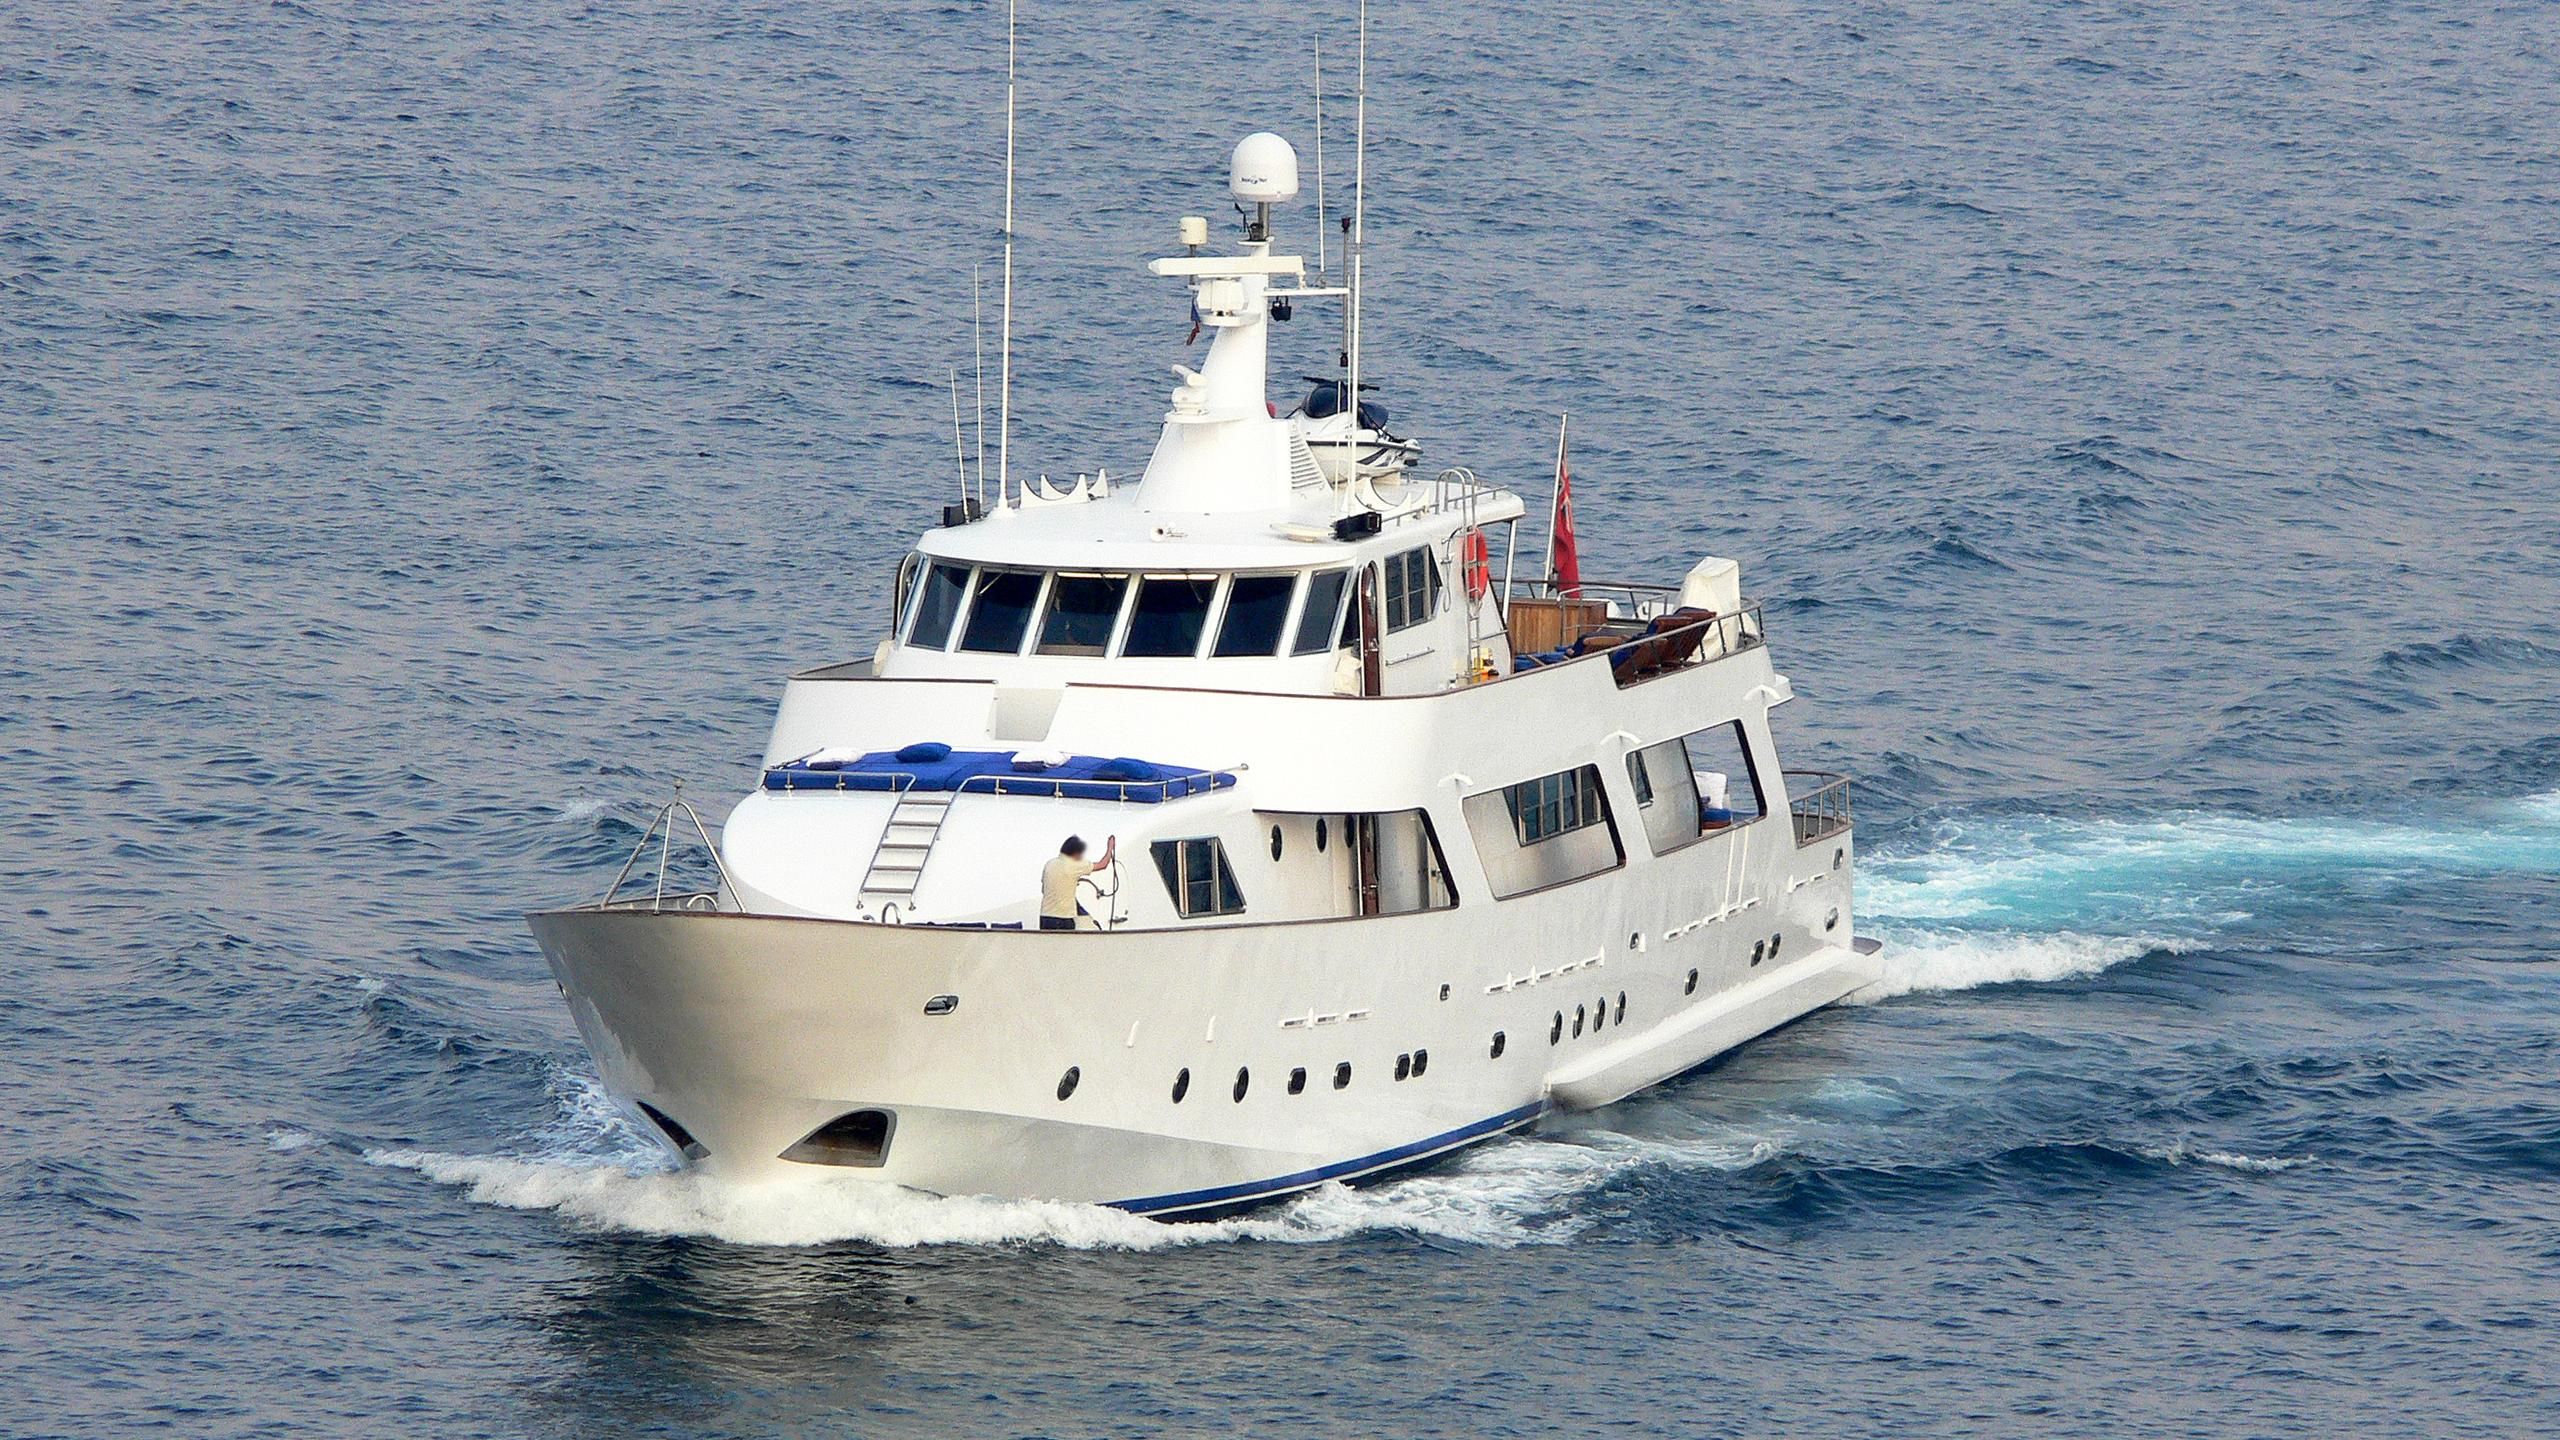 ava-motor-yacht-crn-1976-40m-bow-cruising